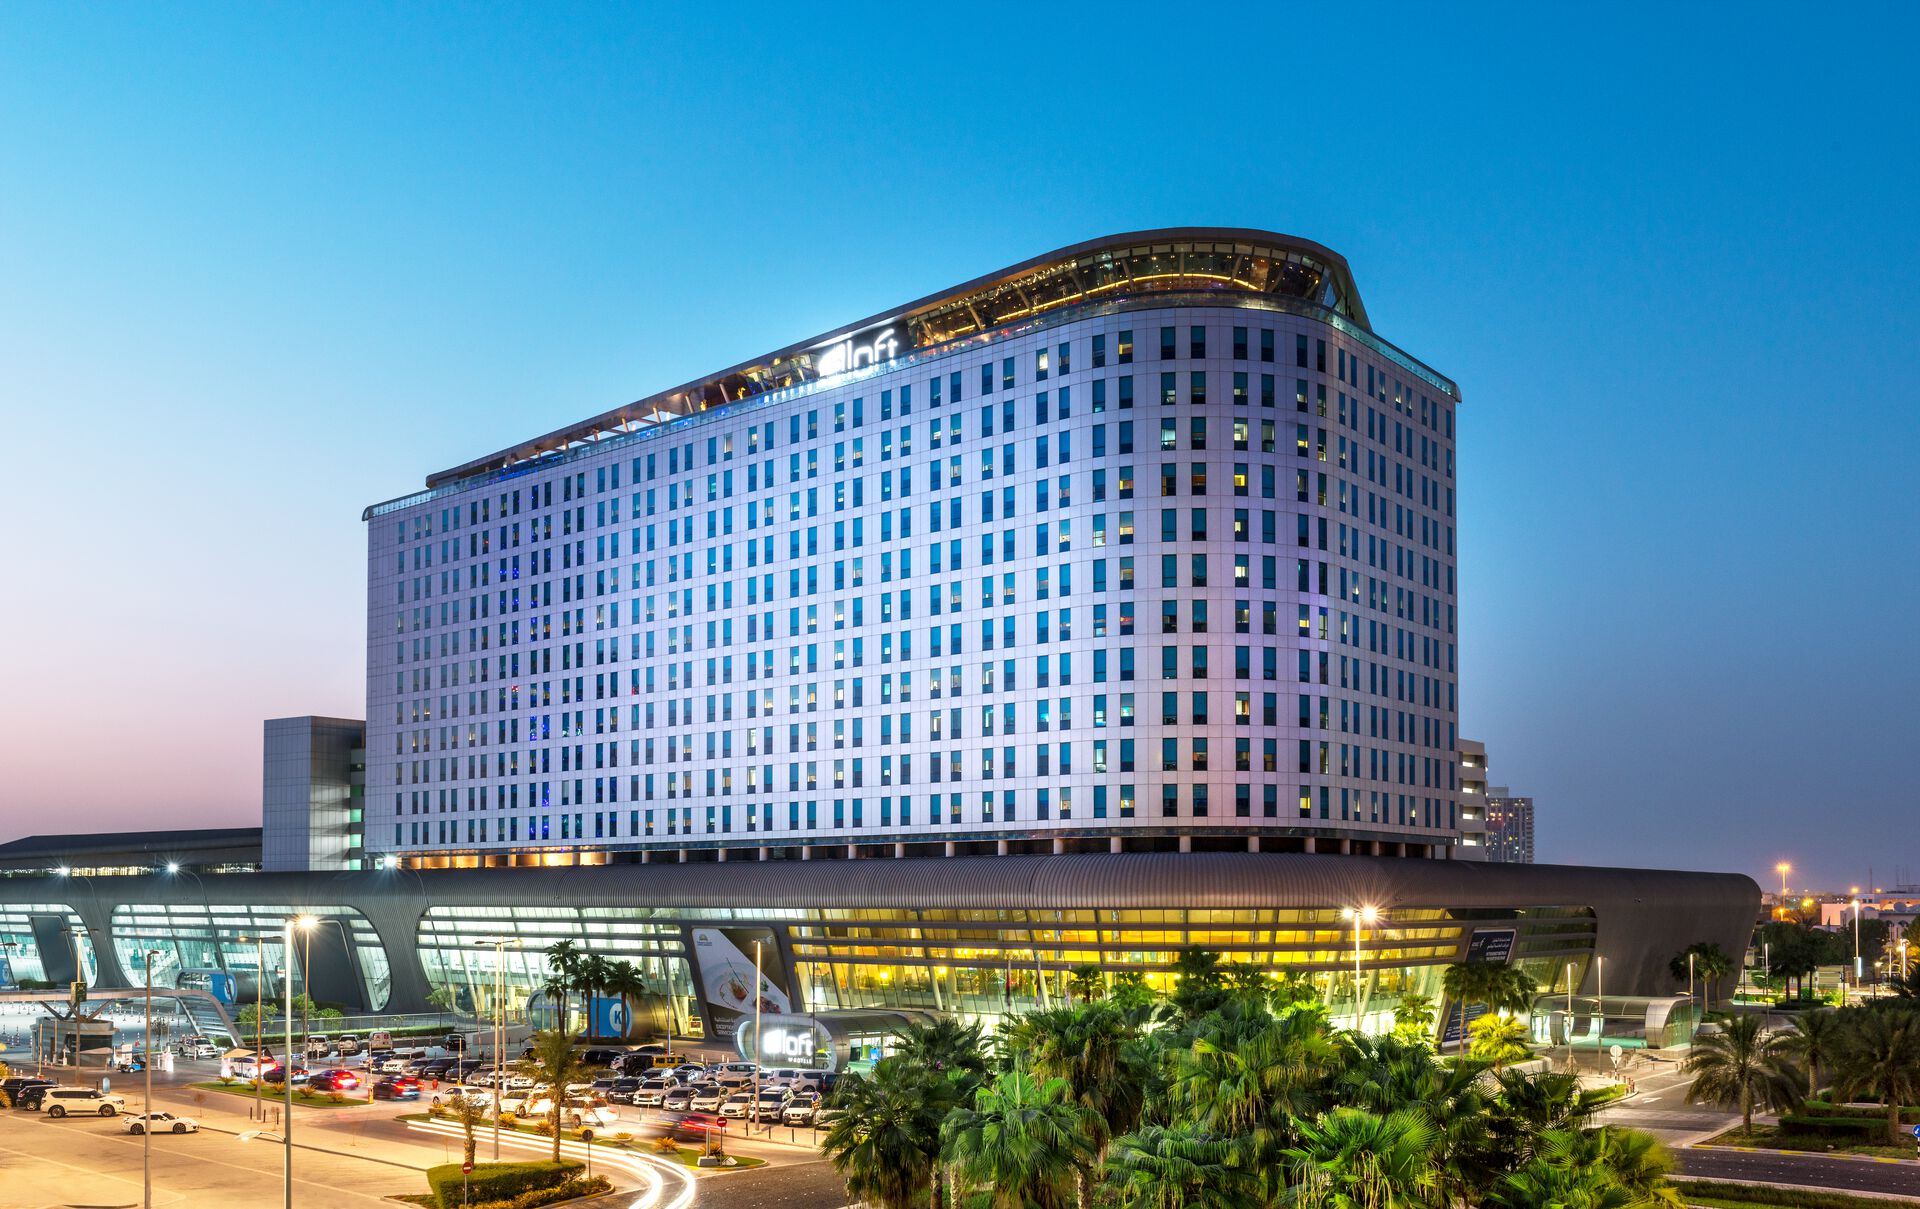 Séjour Abu Dhabi - Aloft Abu Dhabi - 4*